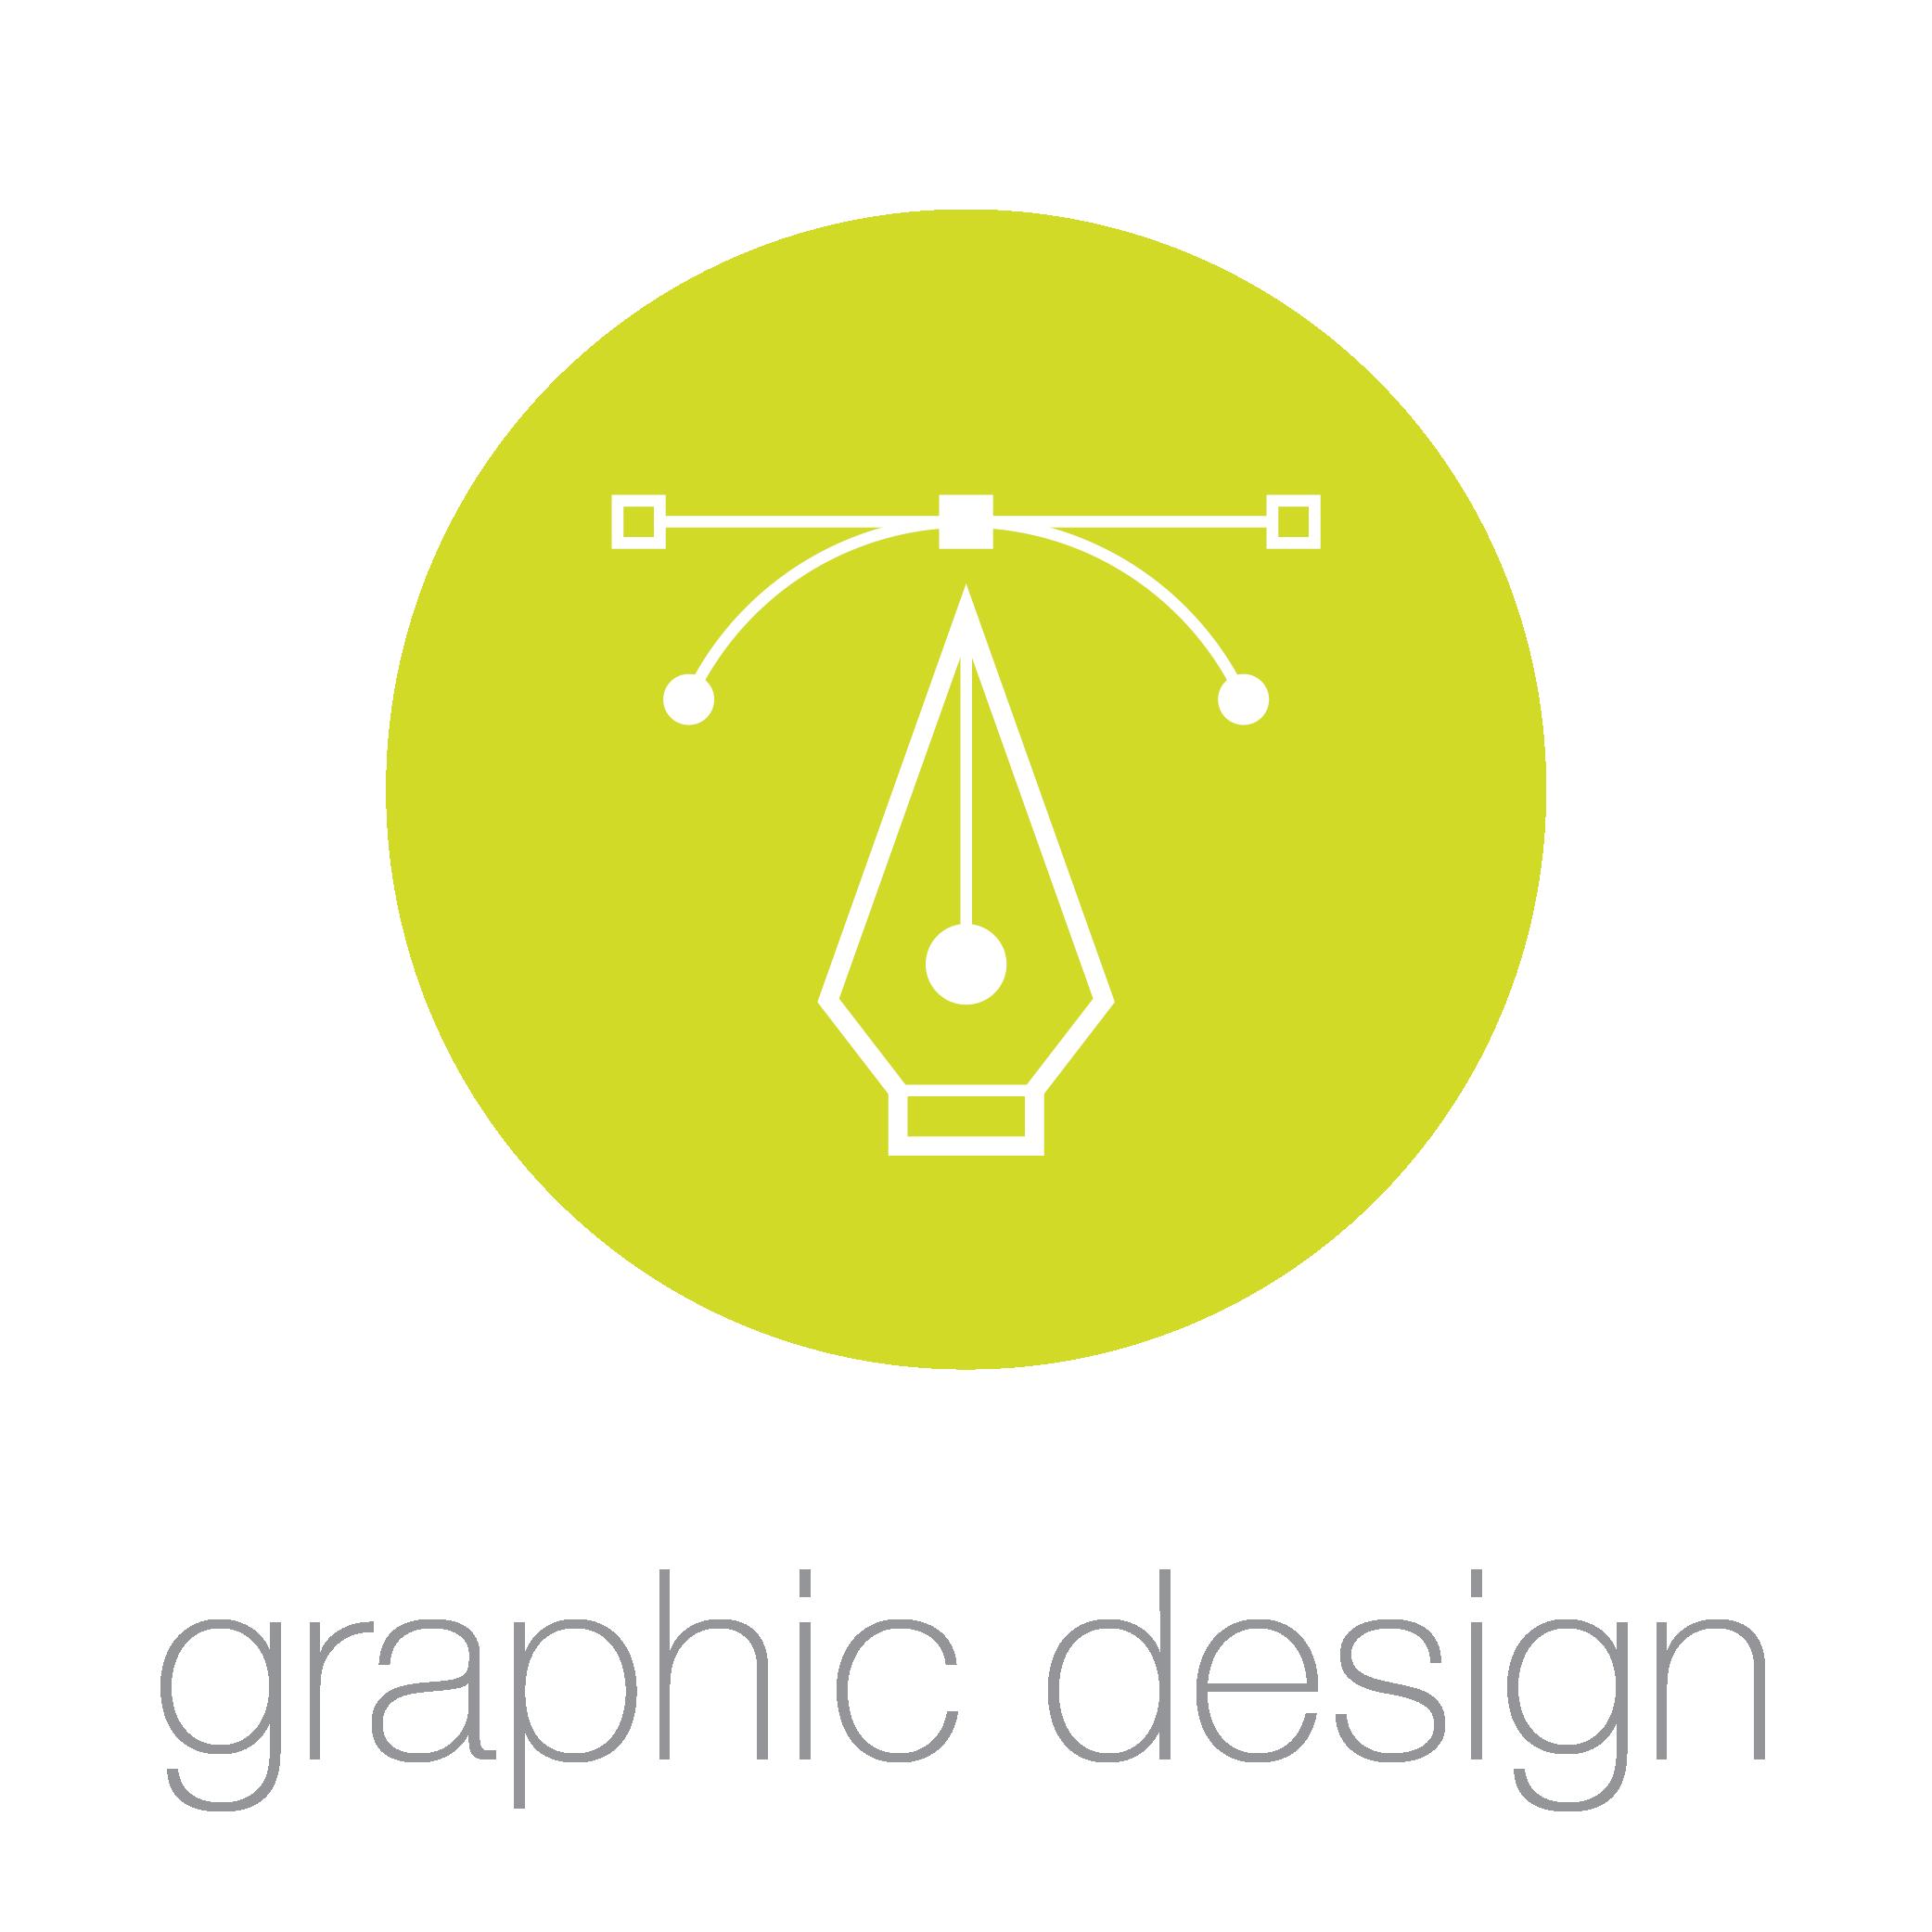 neutral7 services graphic design